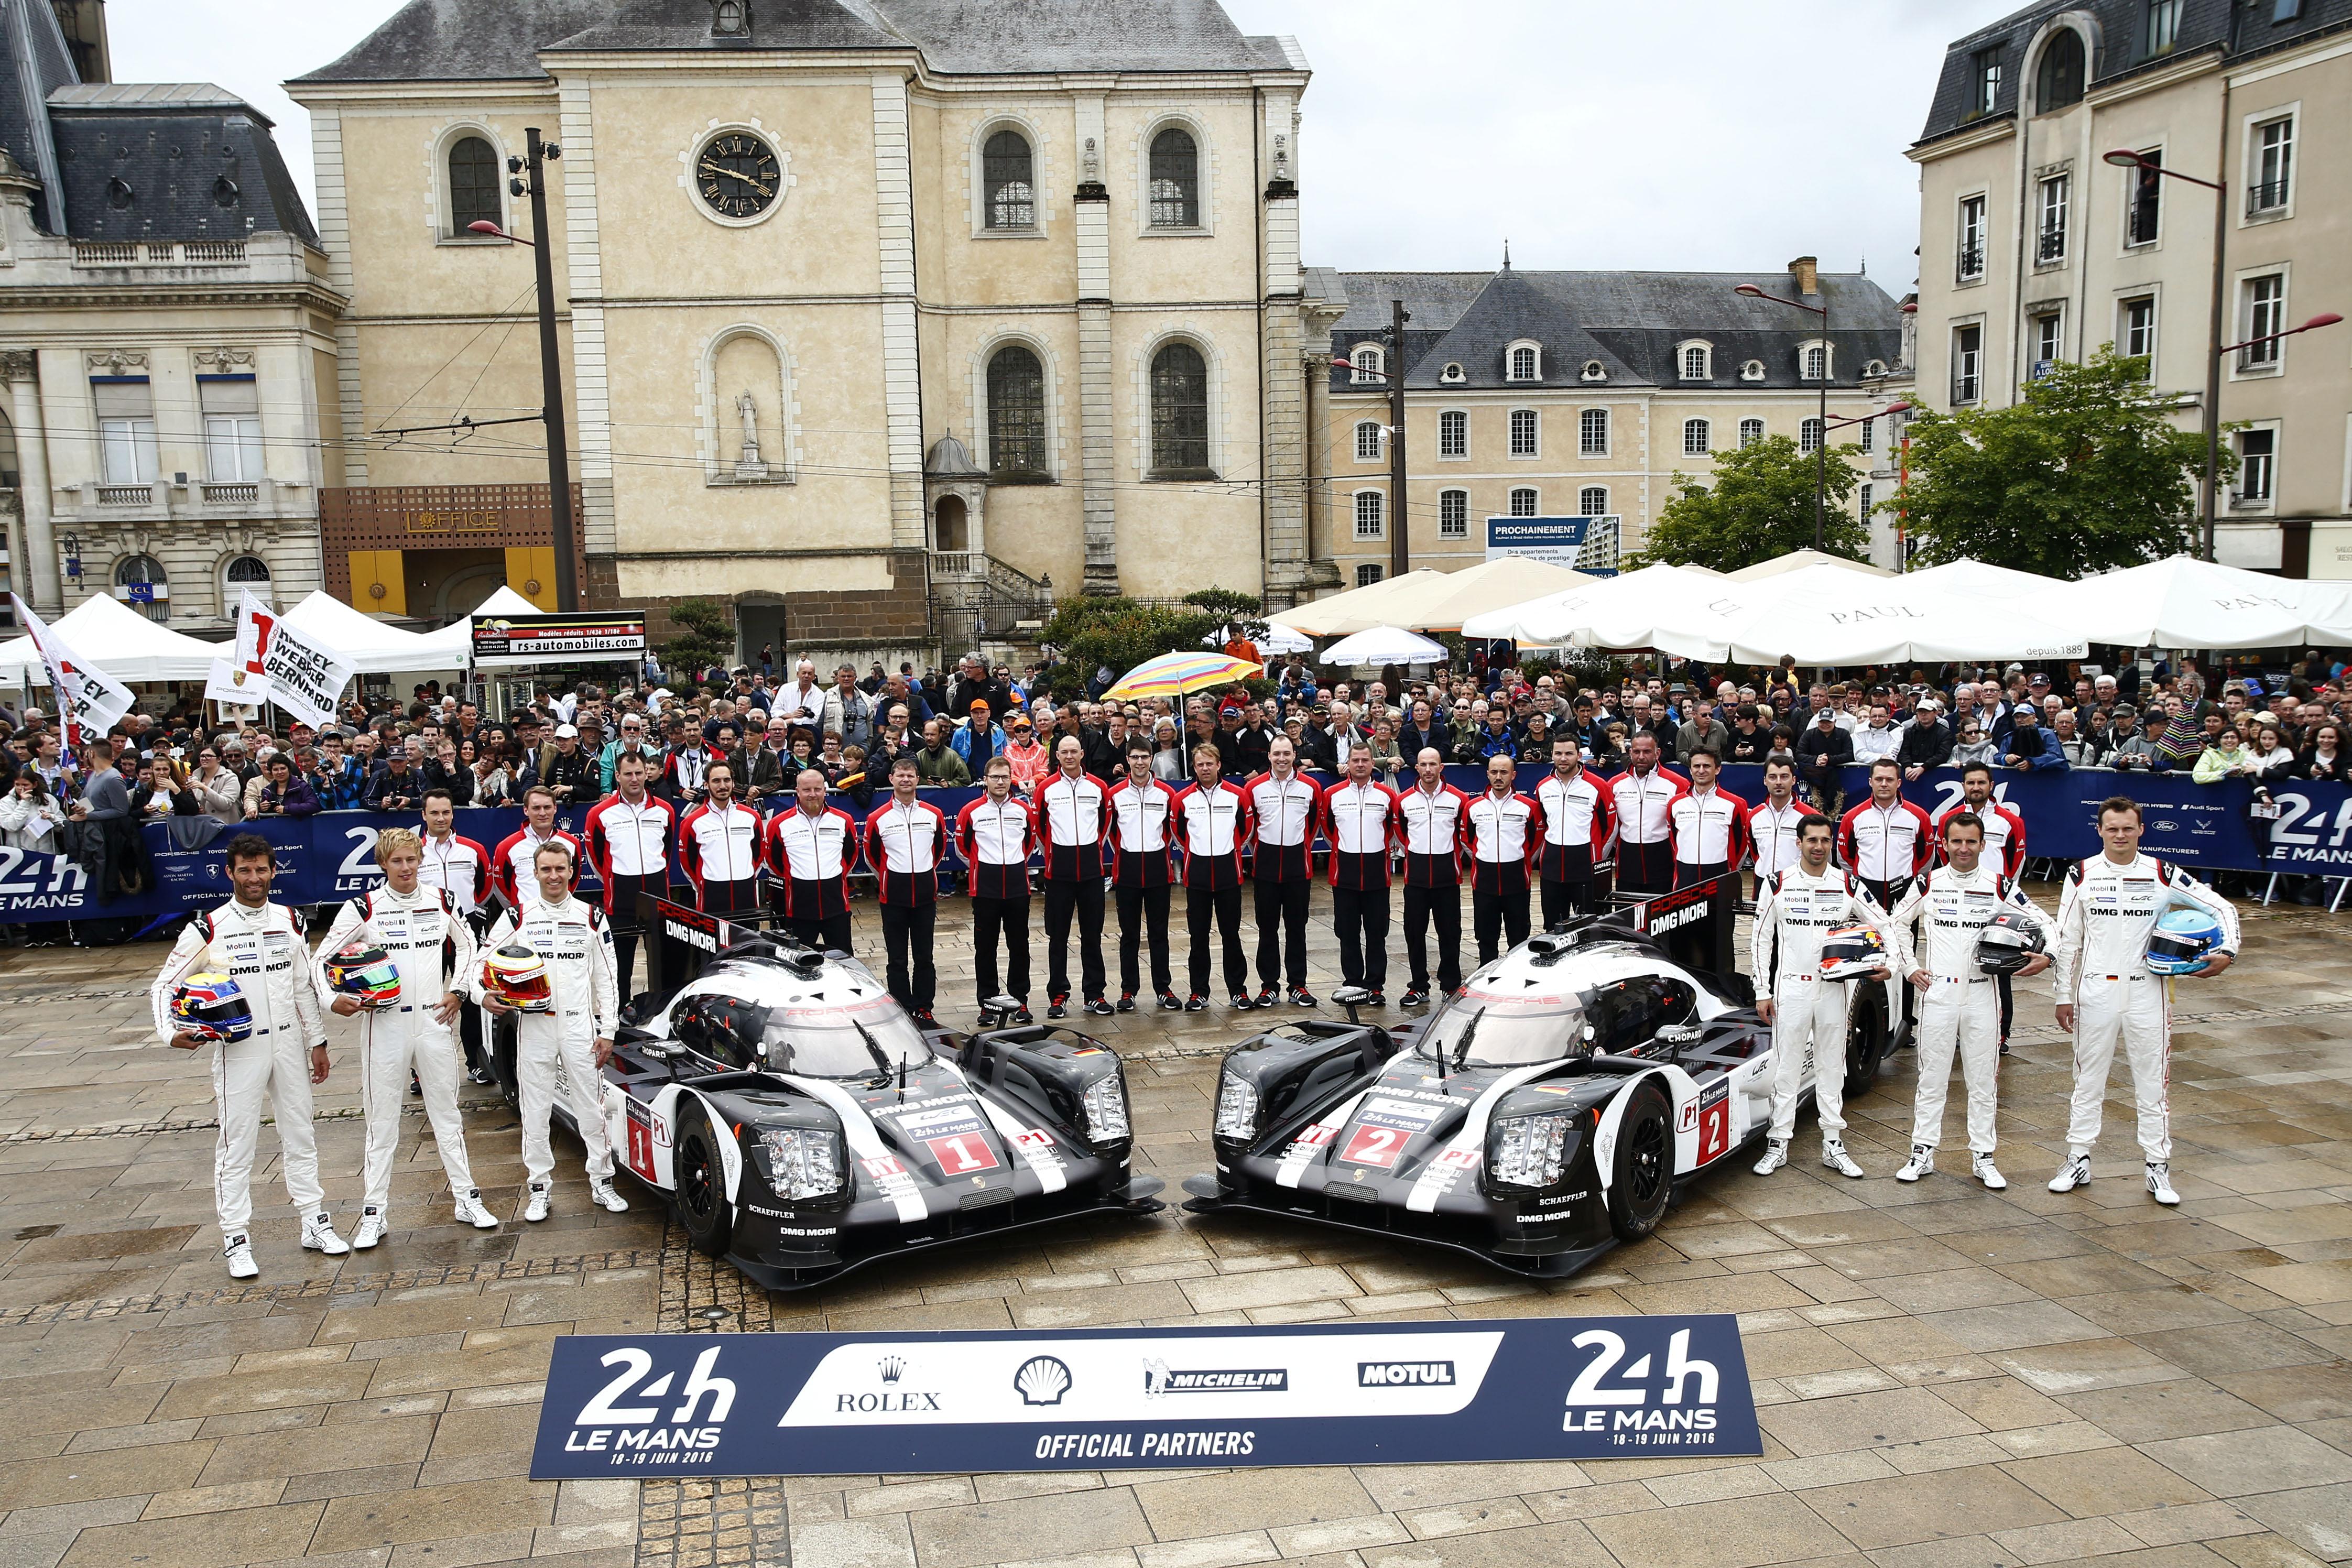 Porsche 919 Hybrid, Porsche Team 1: Mark Webber, Brendon Hartley, Timo Bernhard, Porsche Team 2: Neel Jani, Romain Dumas, Marc Lieb  (l-r)